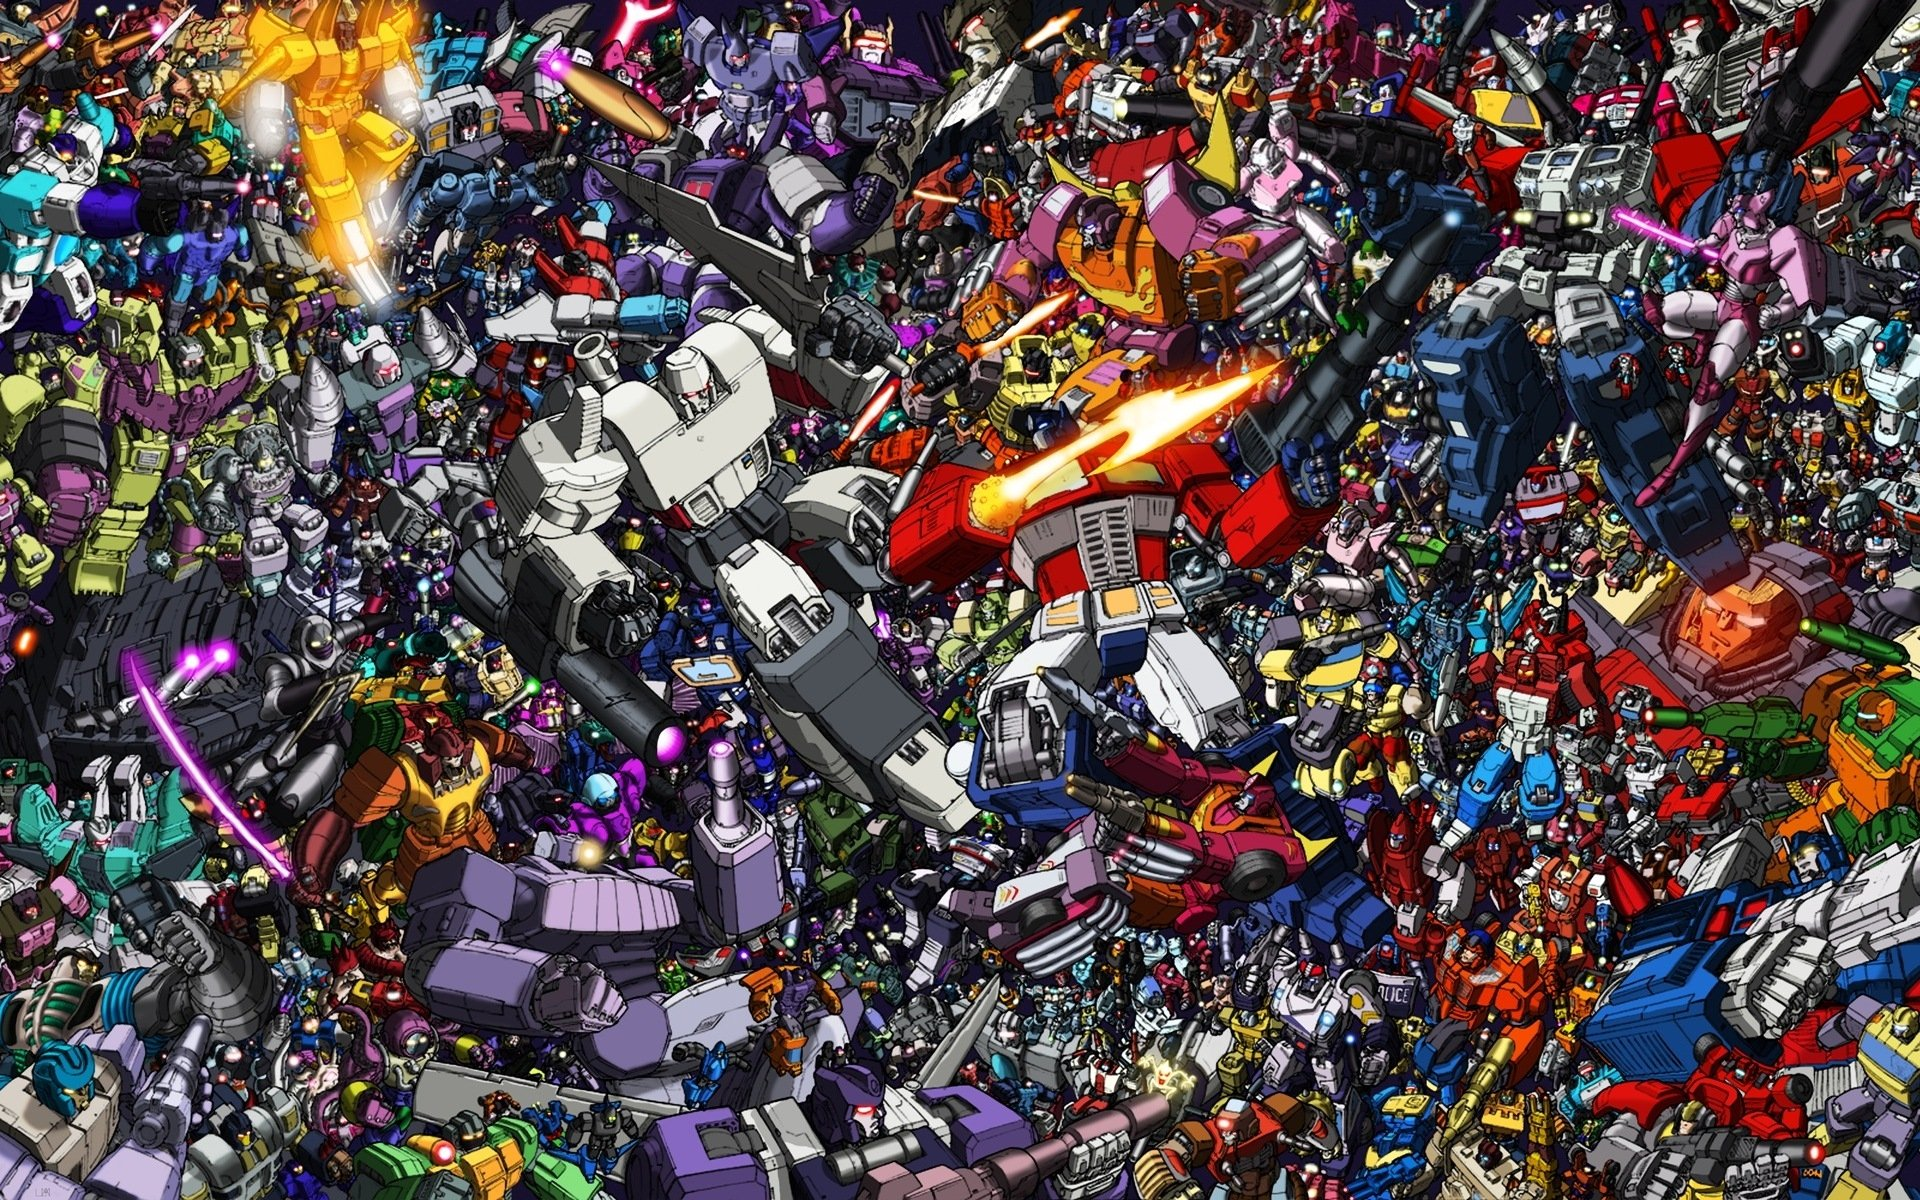 Autobots Transformers G1 Wallpaper